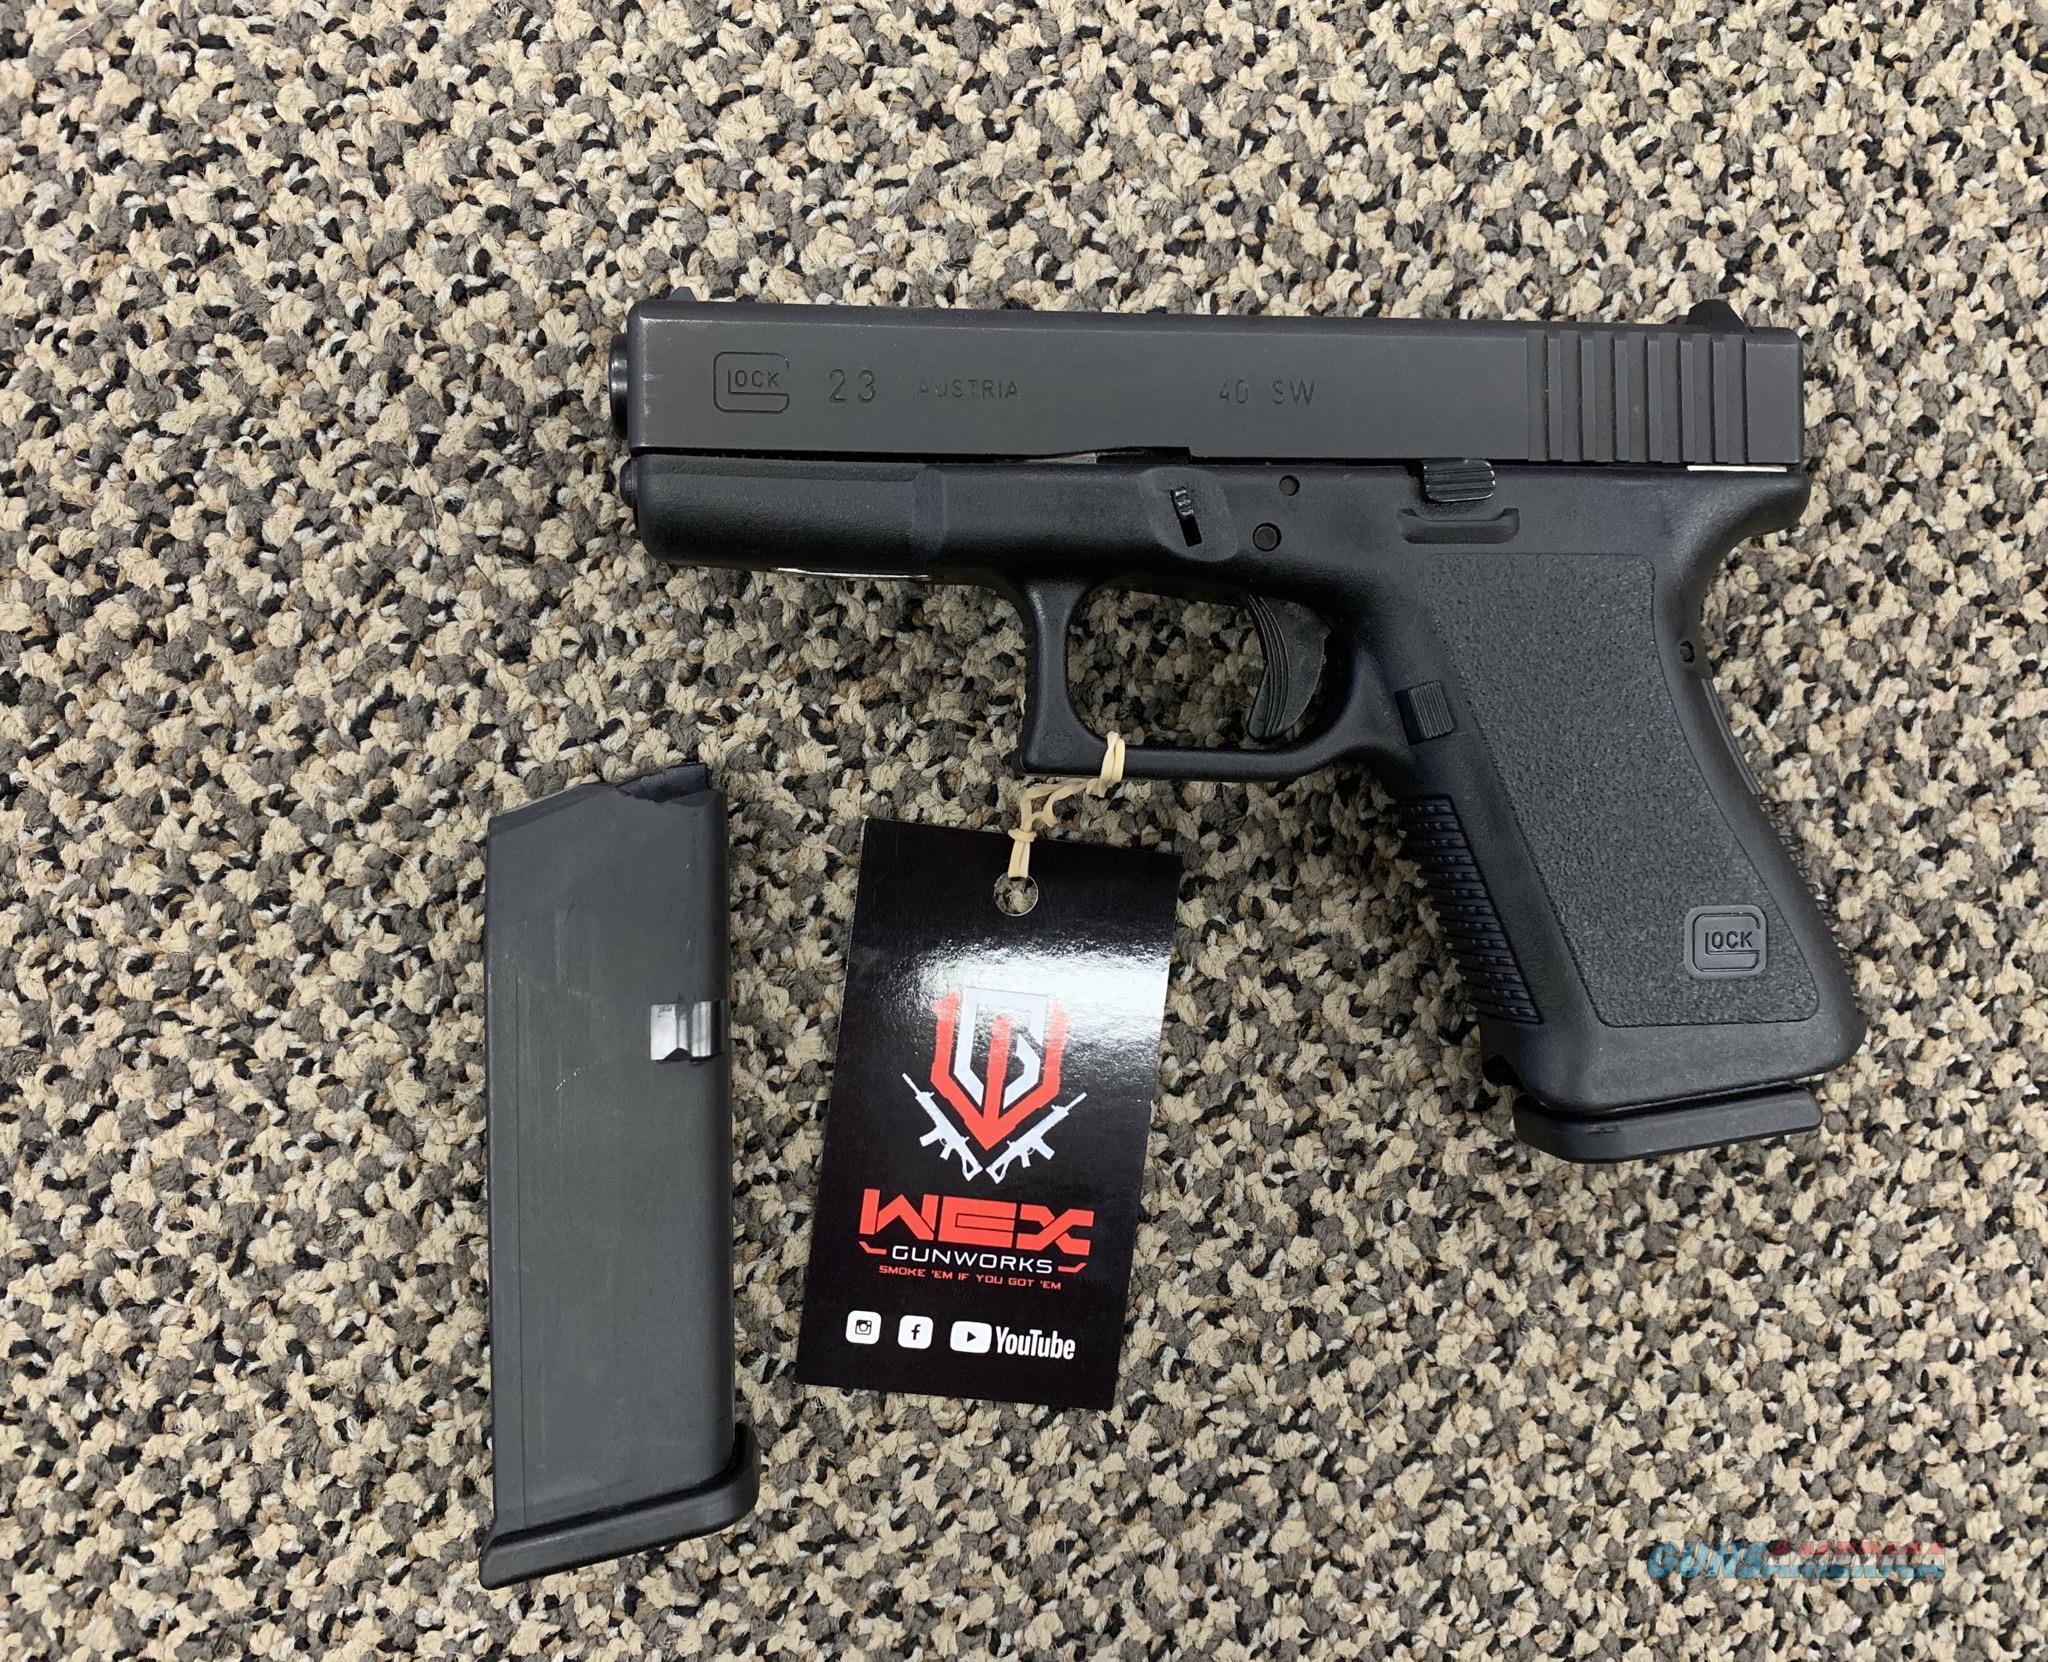 GLOCK 23 .40 S&W GENERATION 2  Guns > Pistols > Glock Pistols > 23